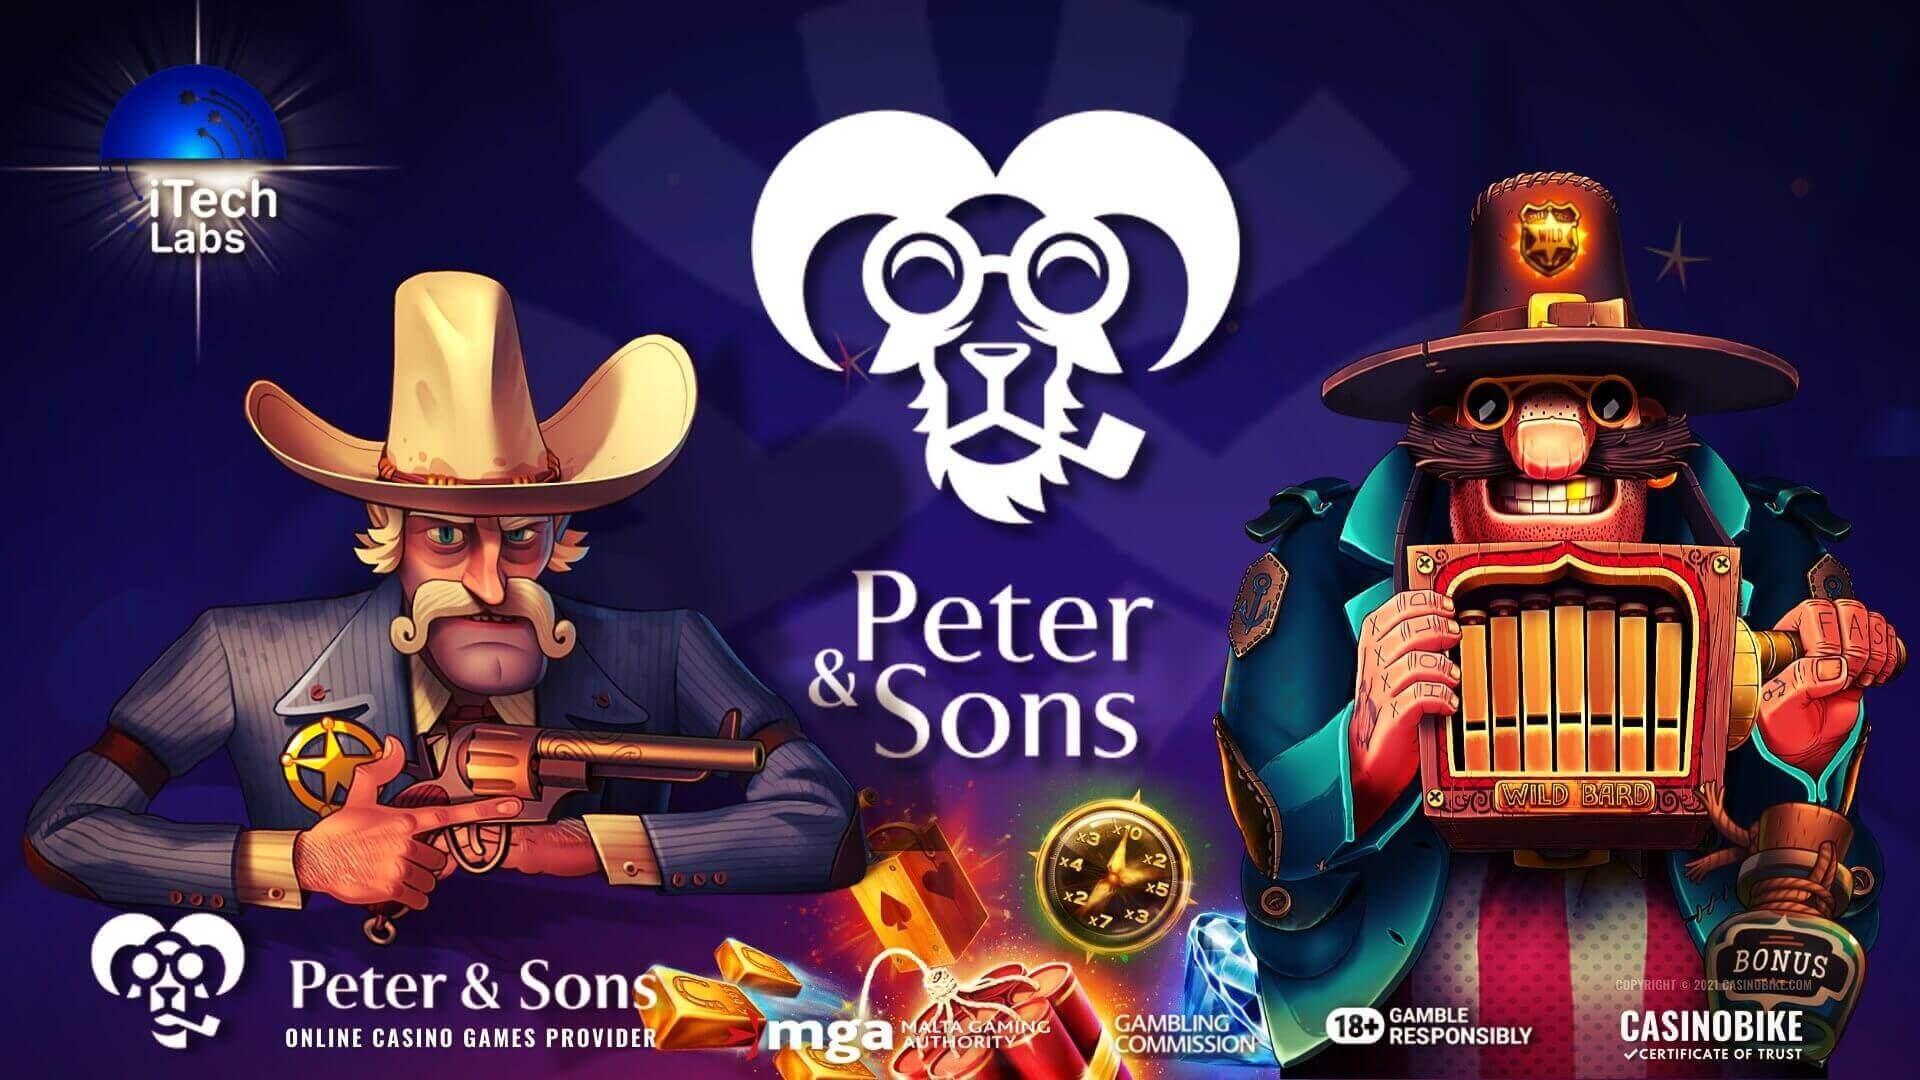 Peter & Sons LLC Game Development Studio Review